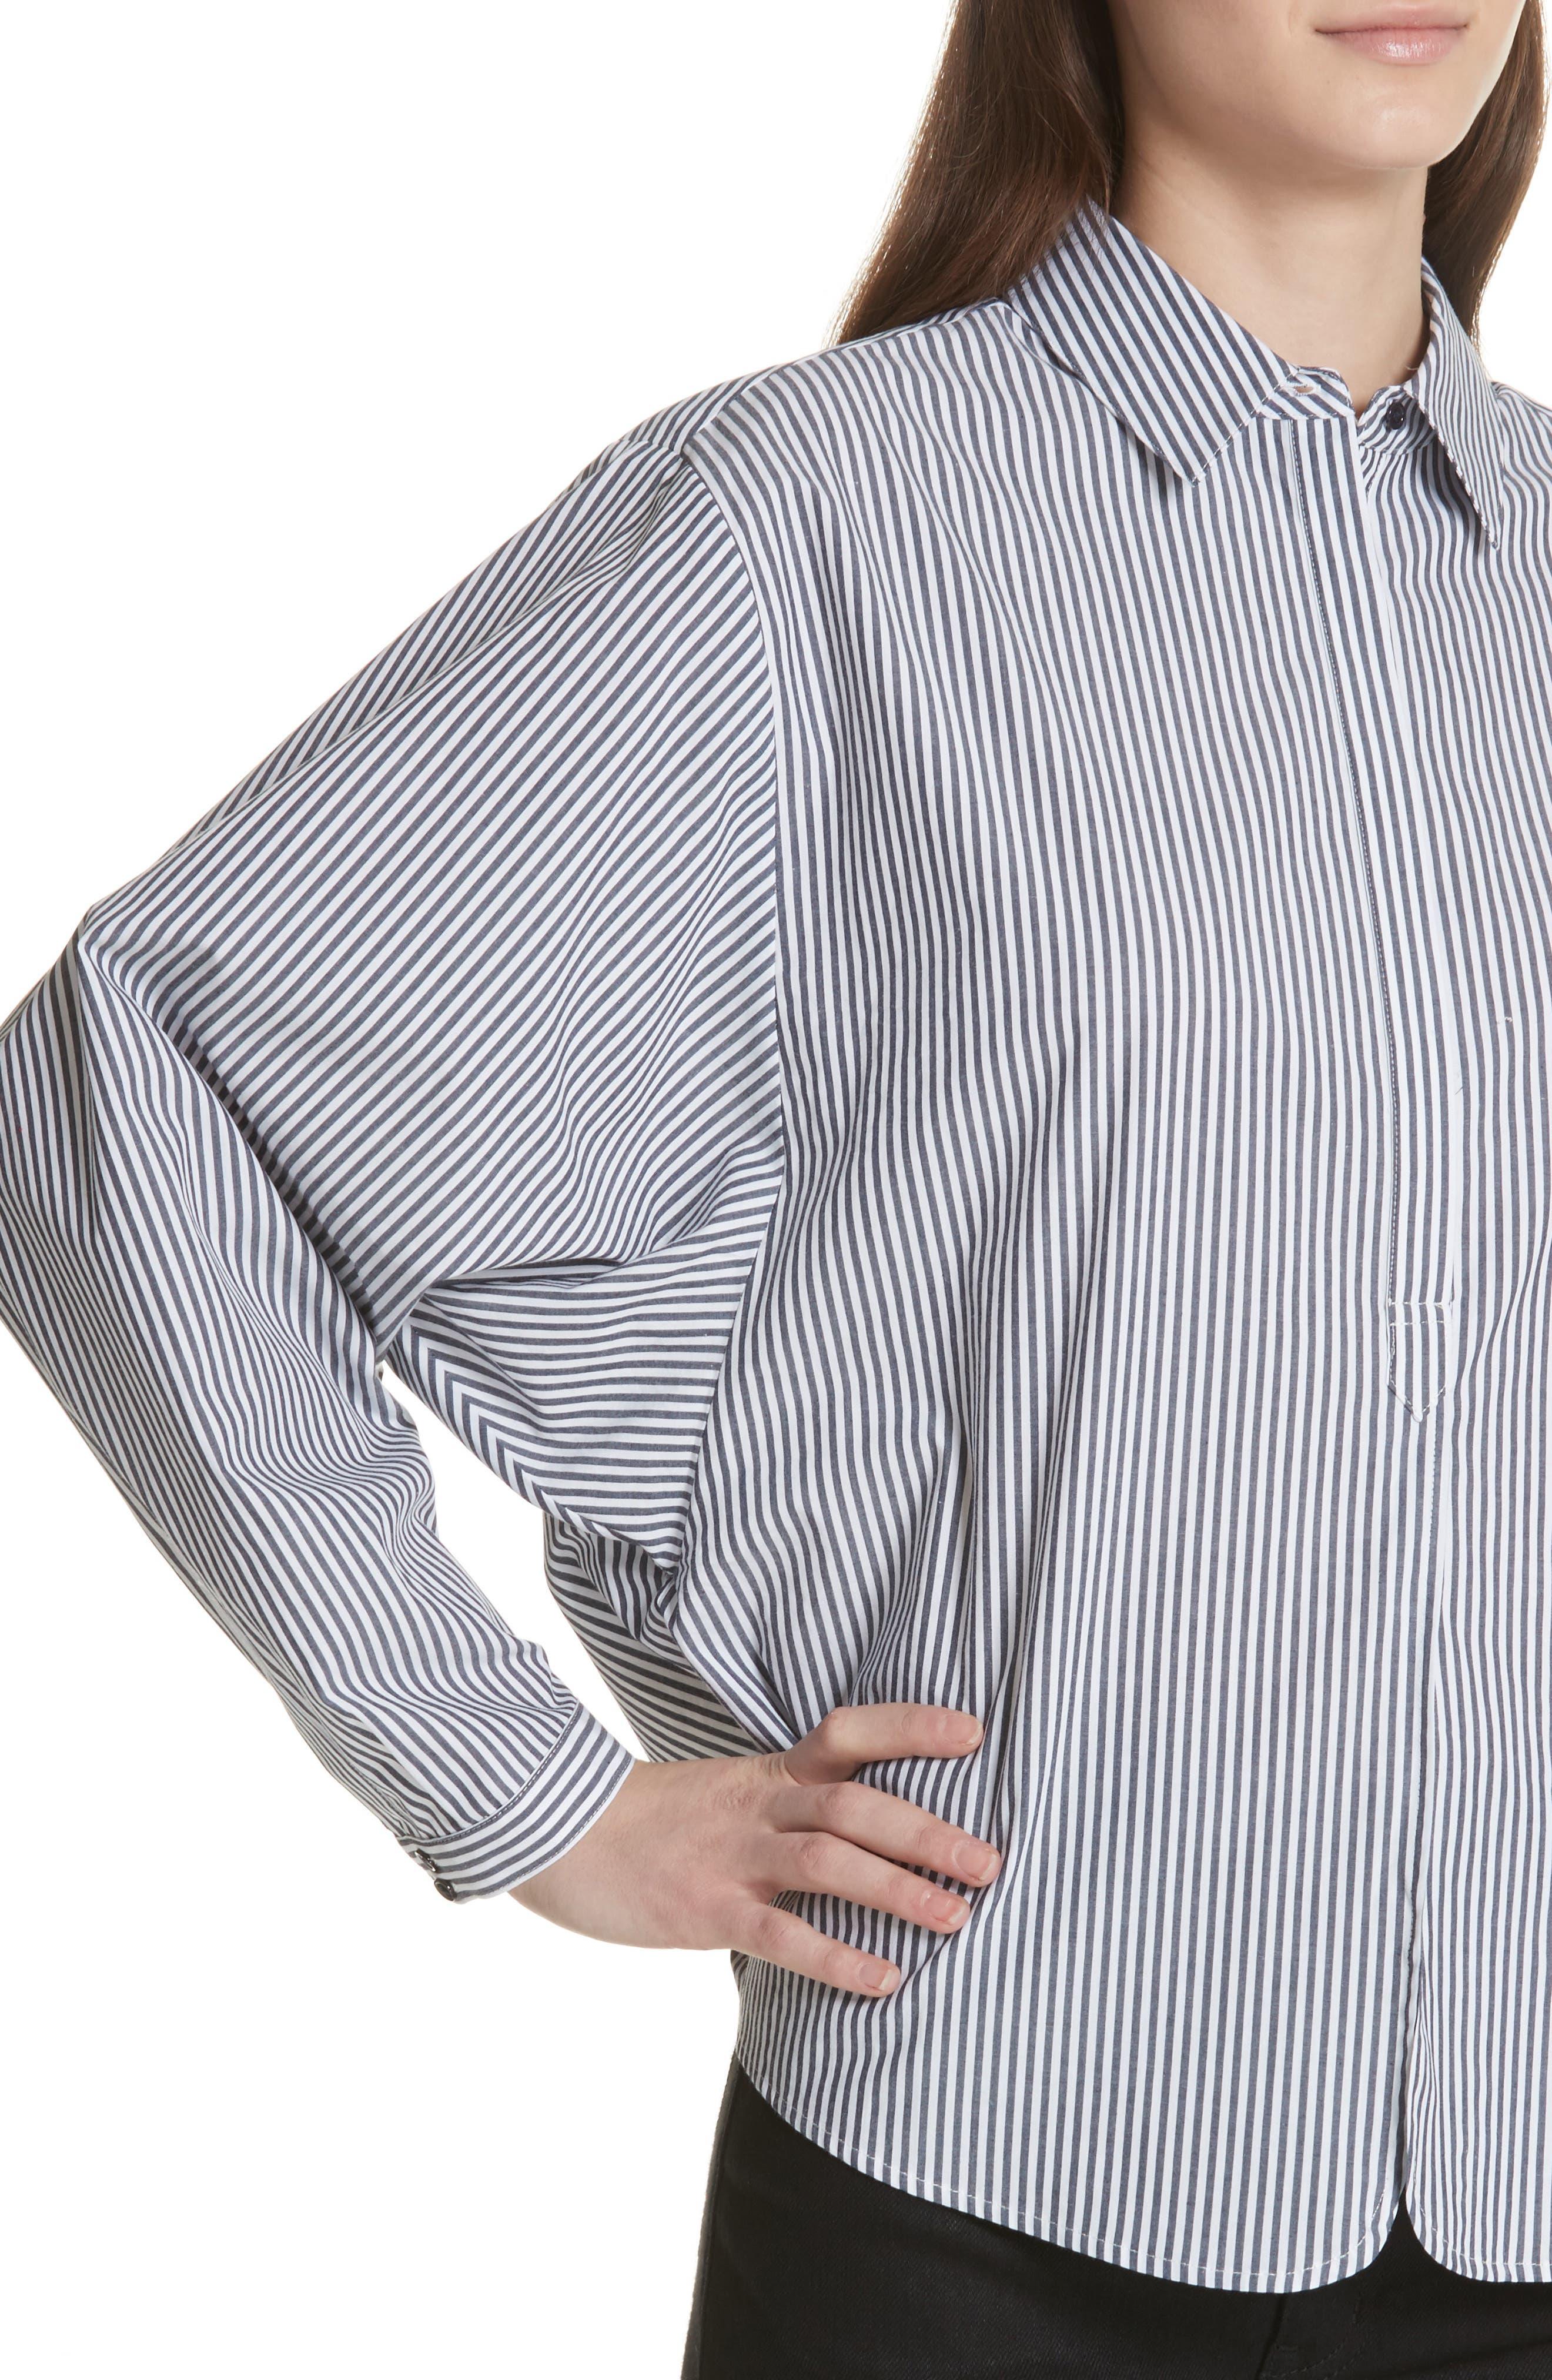 Anjanique Spread Collar Top,                             Alternate thumbnail 4, color,                             Dark Navy